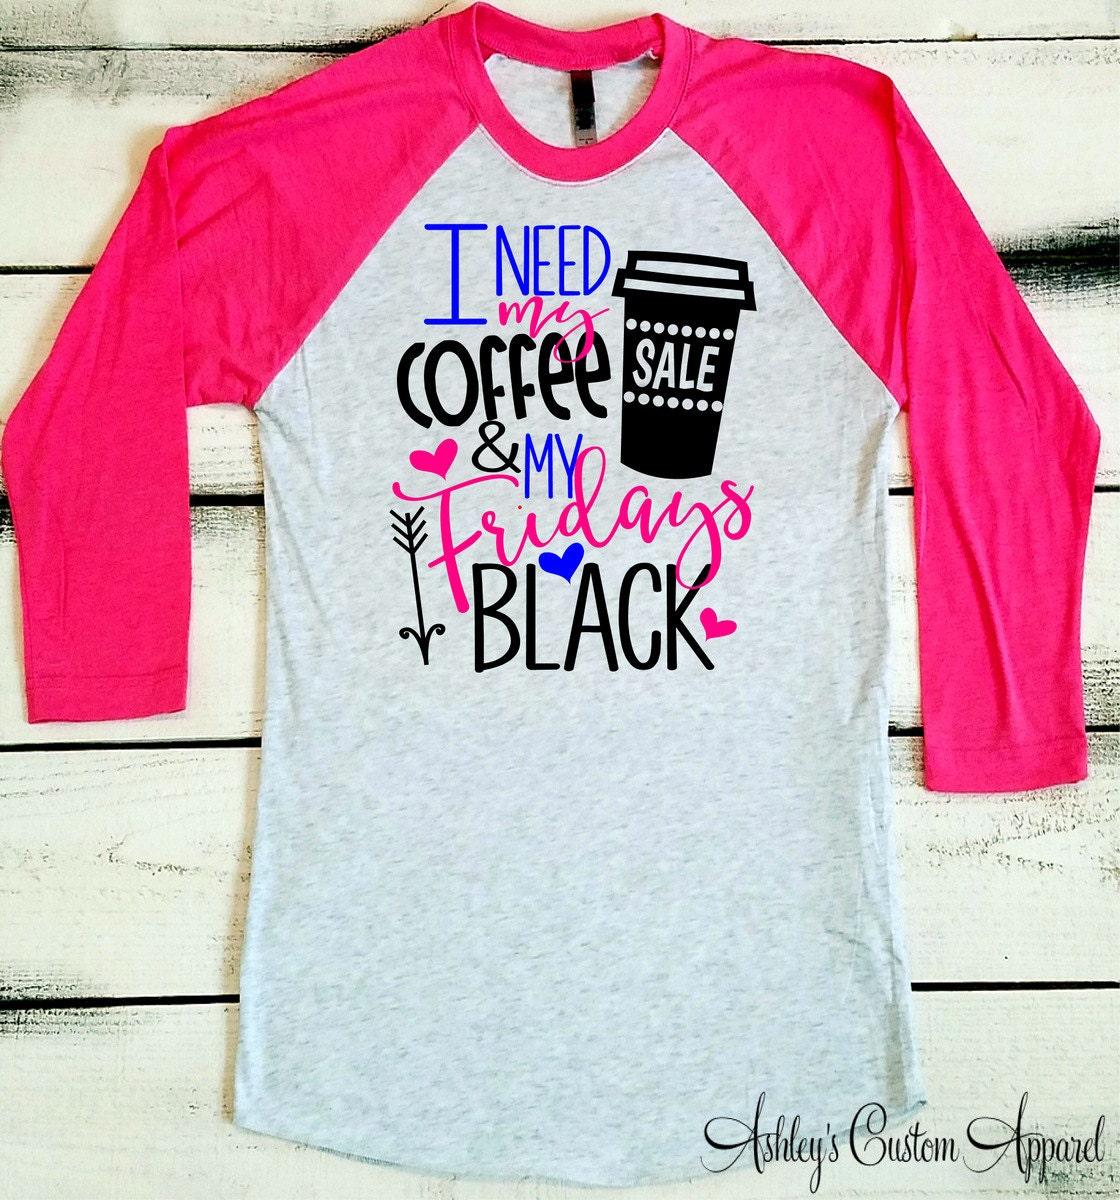 Black Friday Sale Black Friday Shirts Black Friday Team